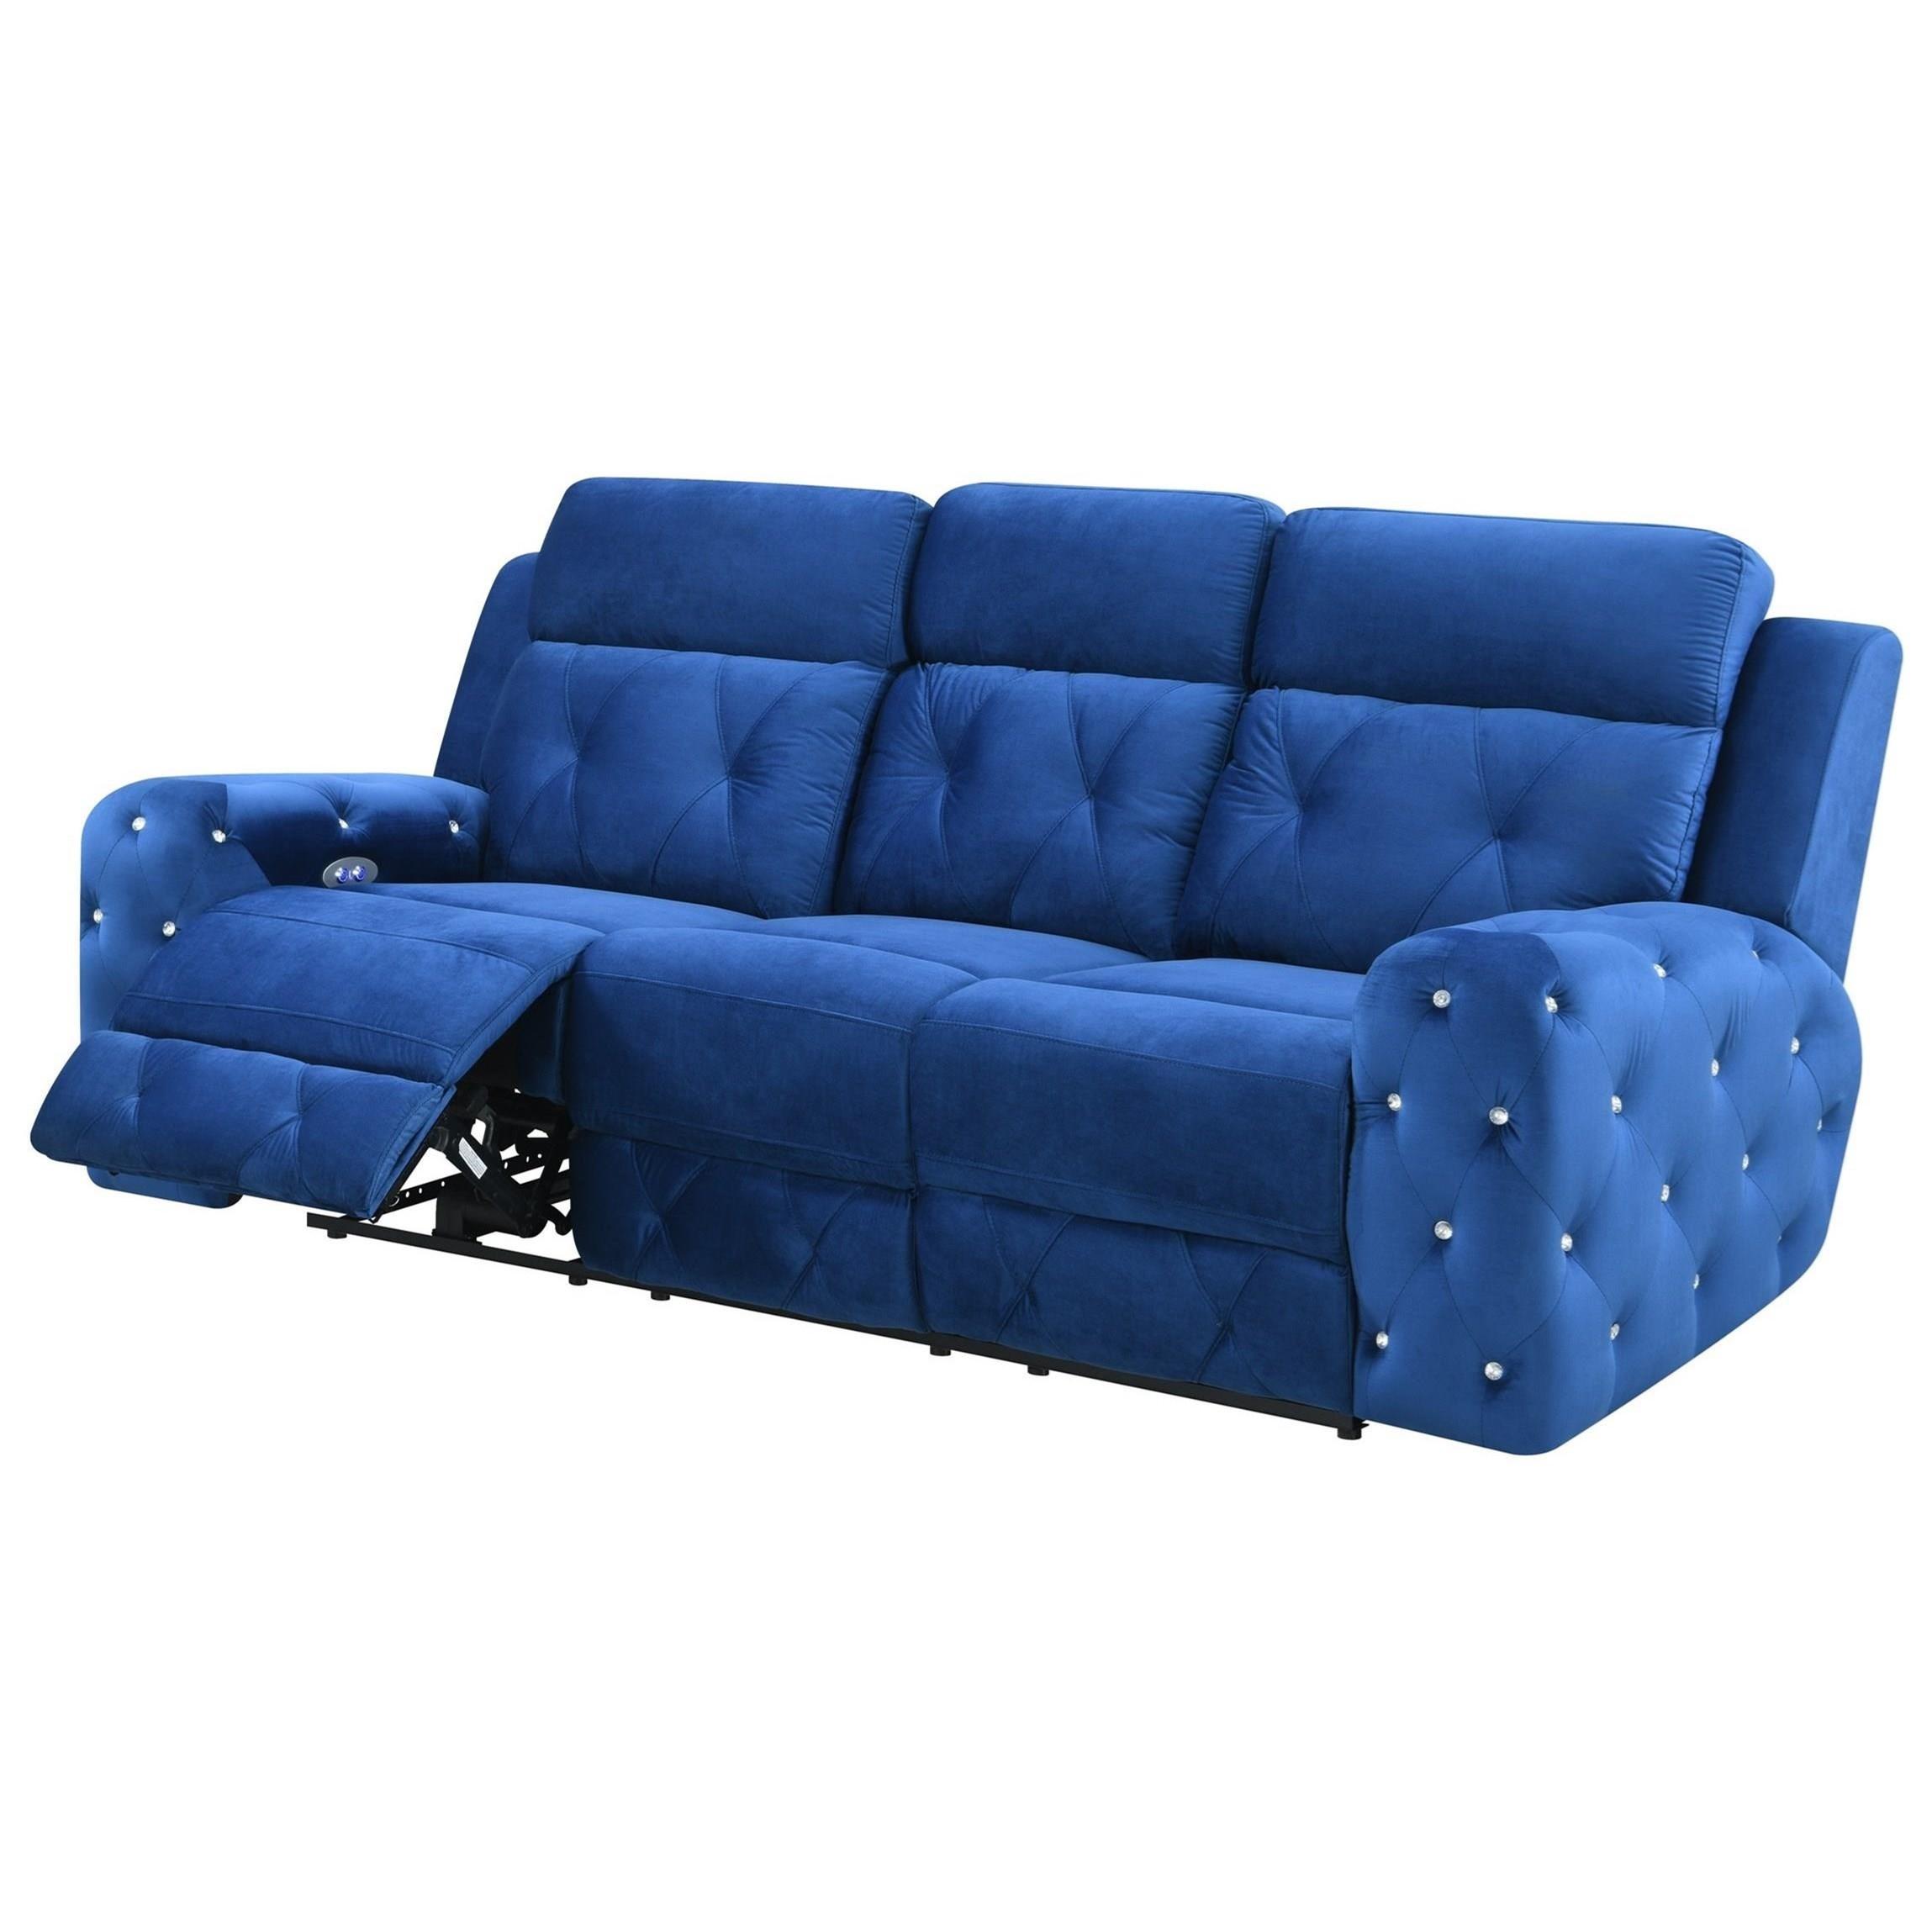 U8311 Power Reclining Sofa by Global Furniture at Nassau Furniture and Mattress